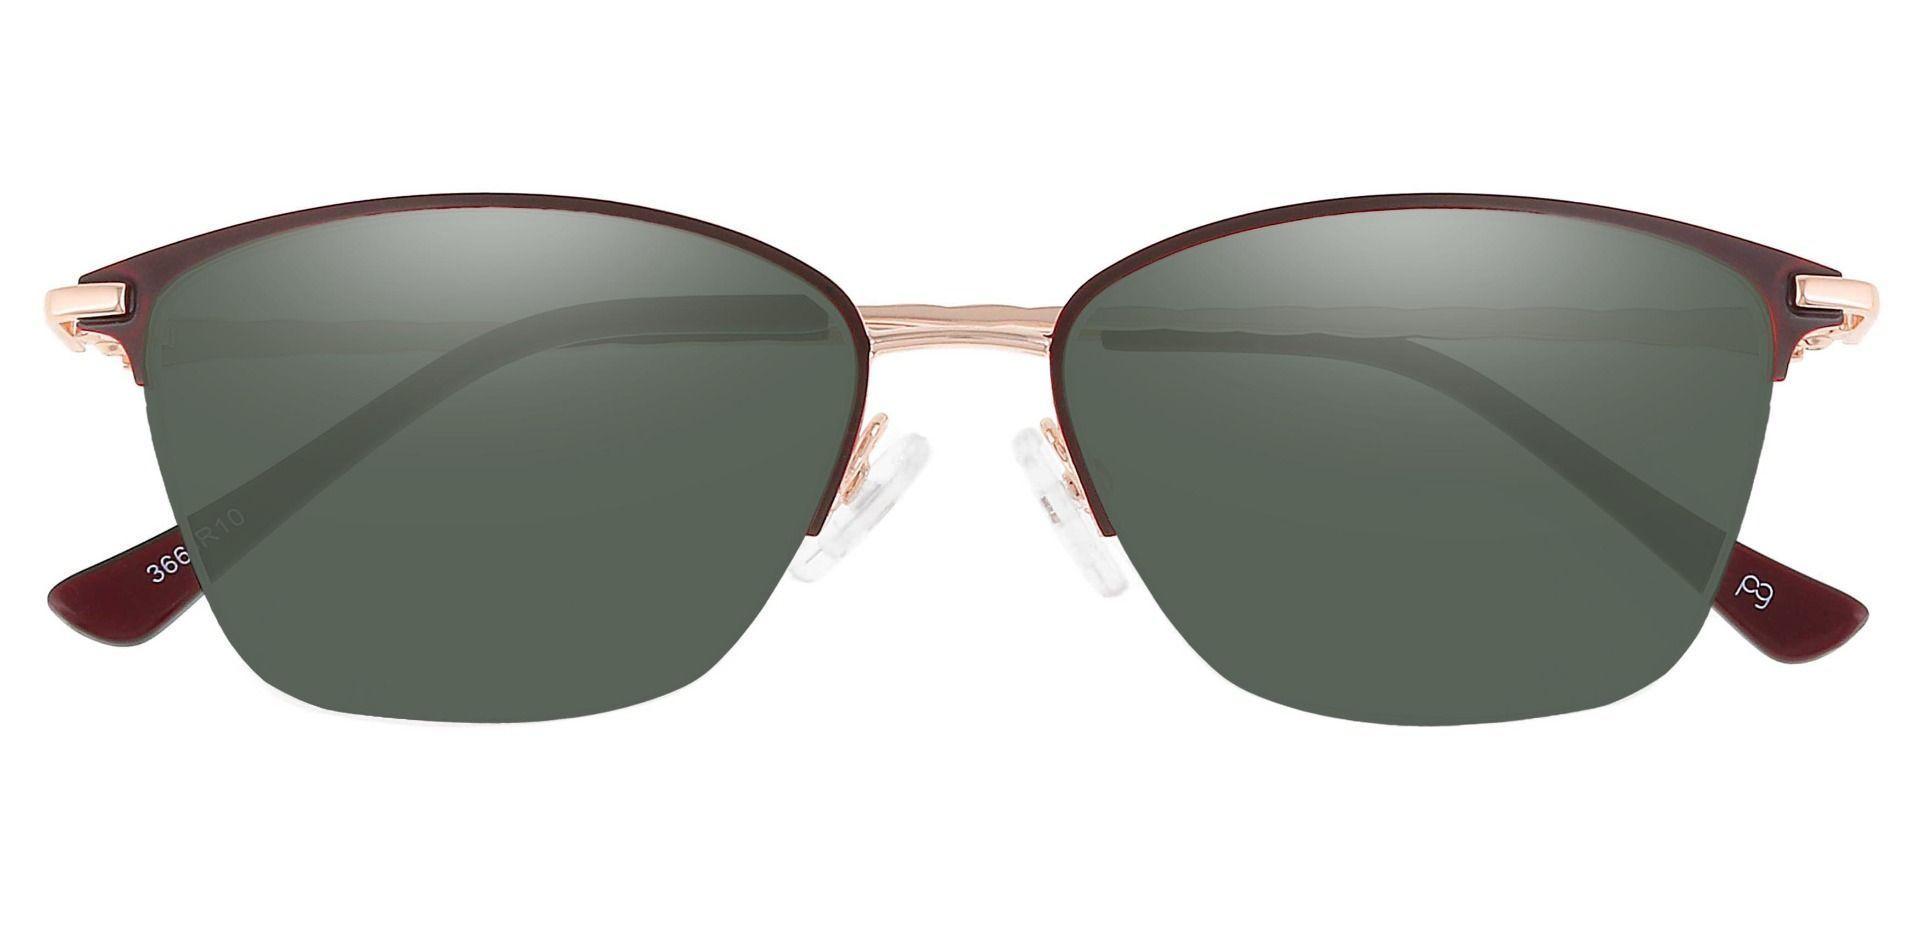 Marigold Rectangle Progressive Sunglasses - Red Frame With Green Lenses